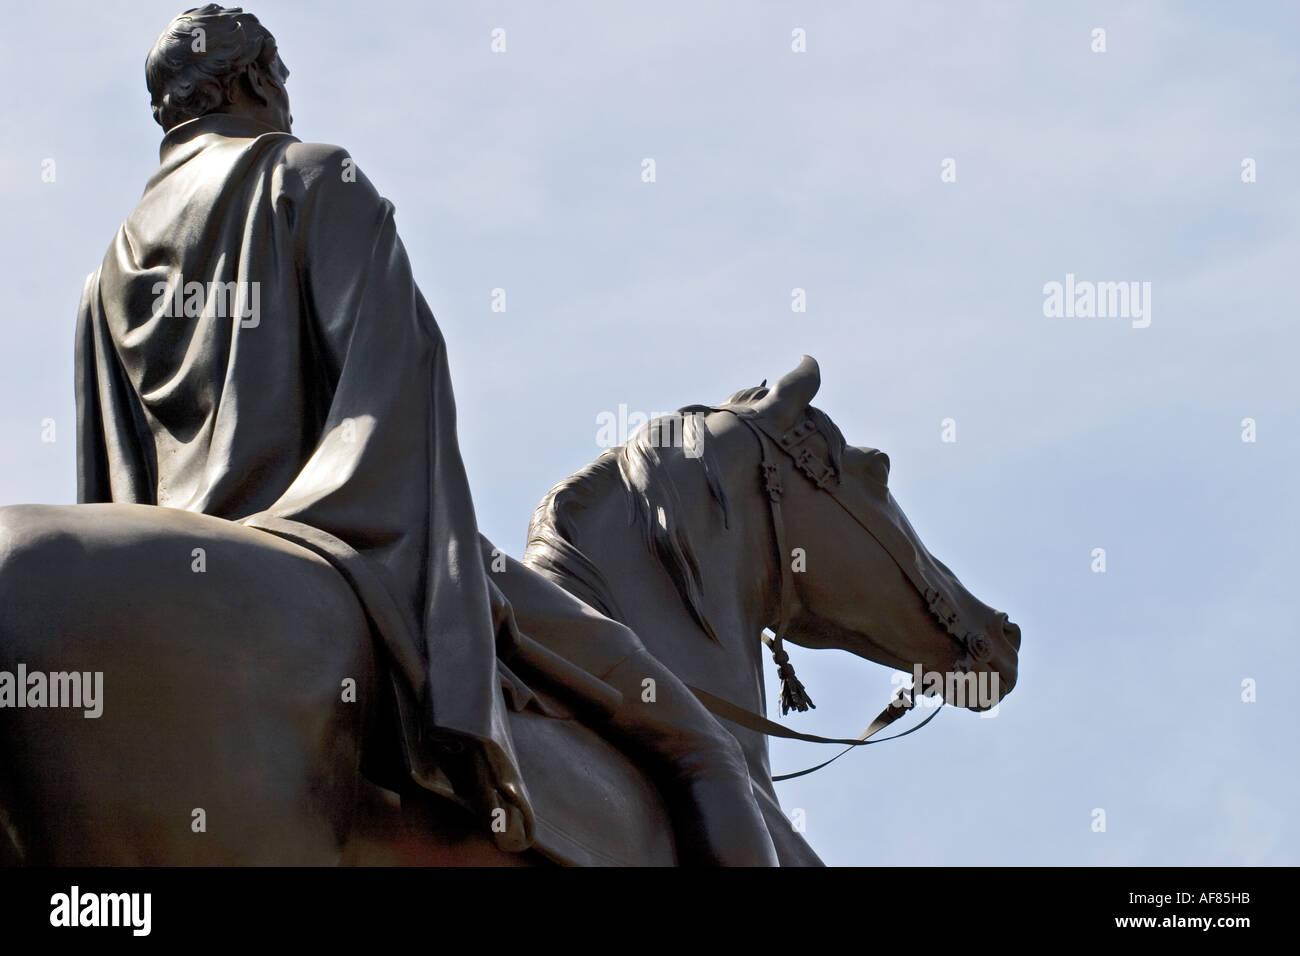 Duke of Wellington statue outside of the Bank of England - Stock Image